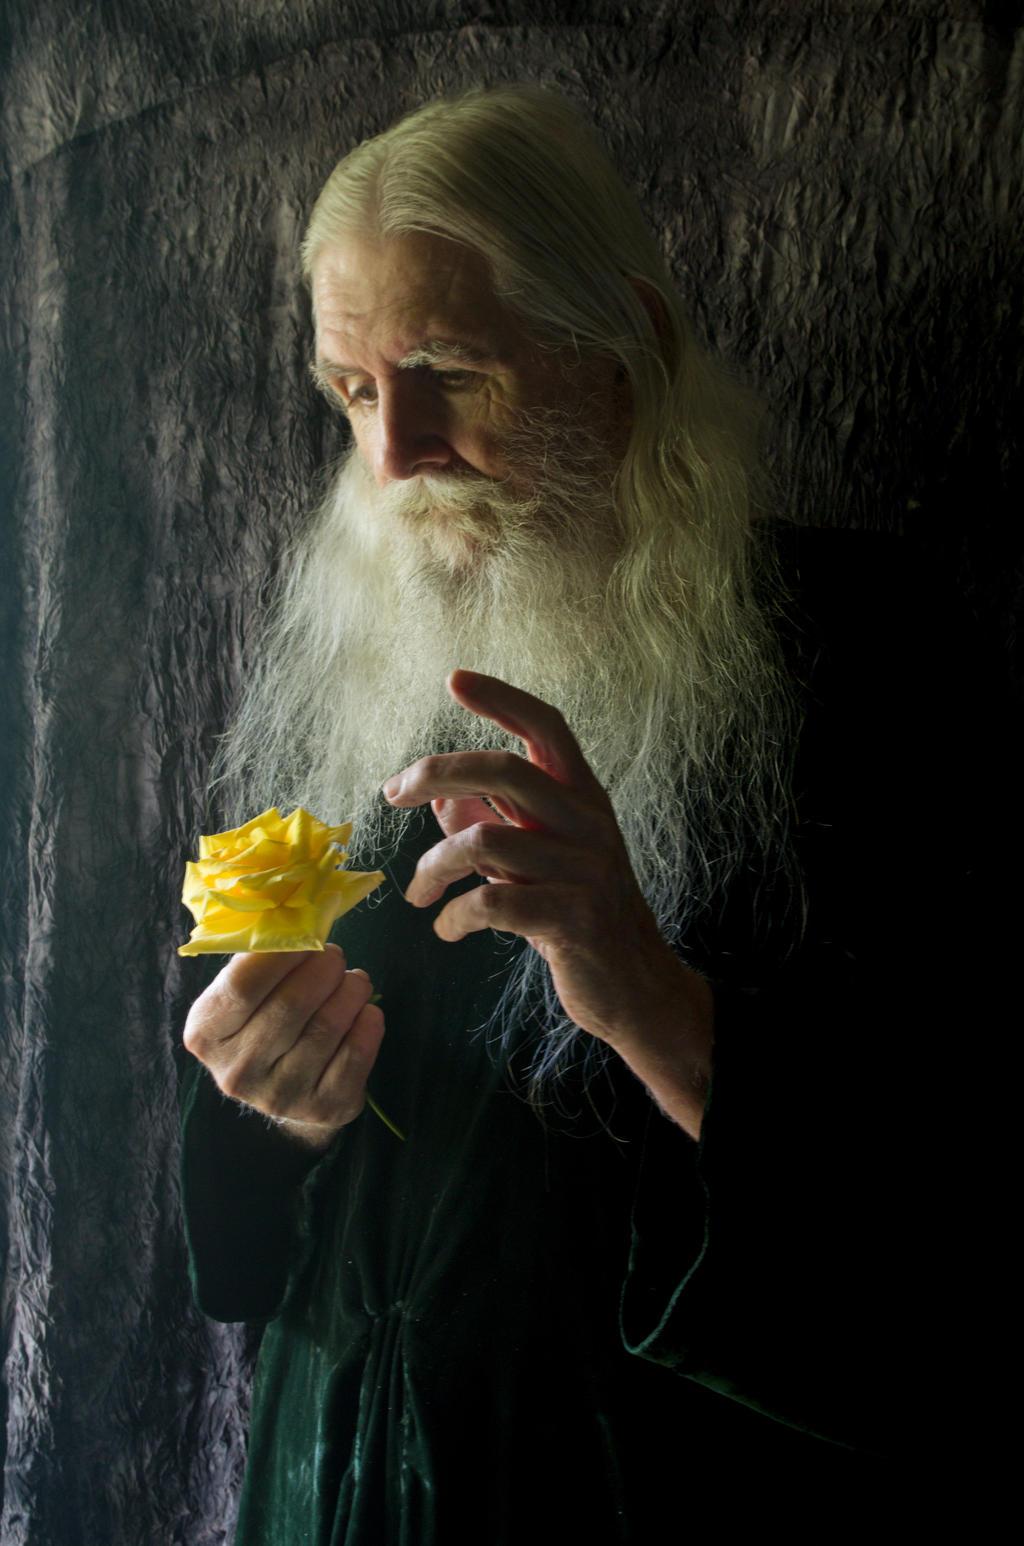 2015-05-19 Elder Portraits 08 by skydancer-stock